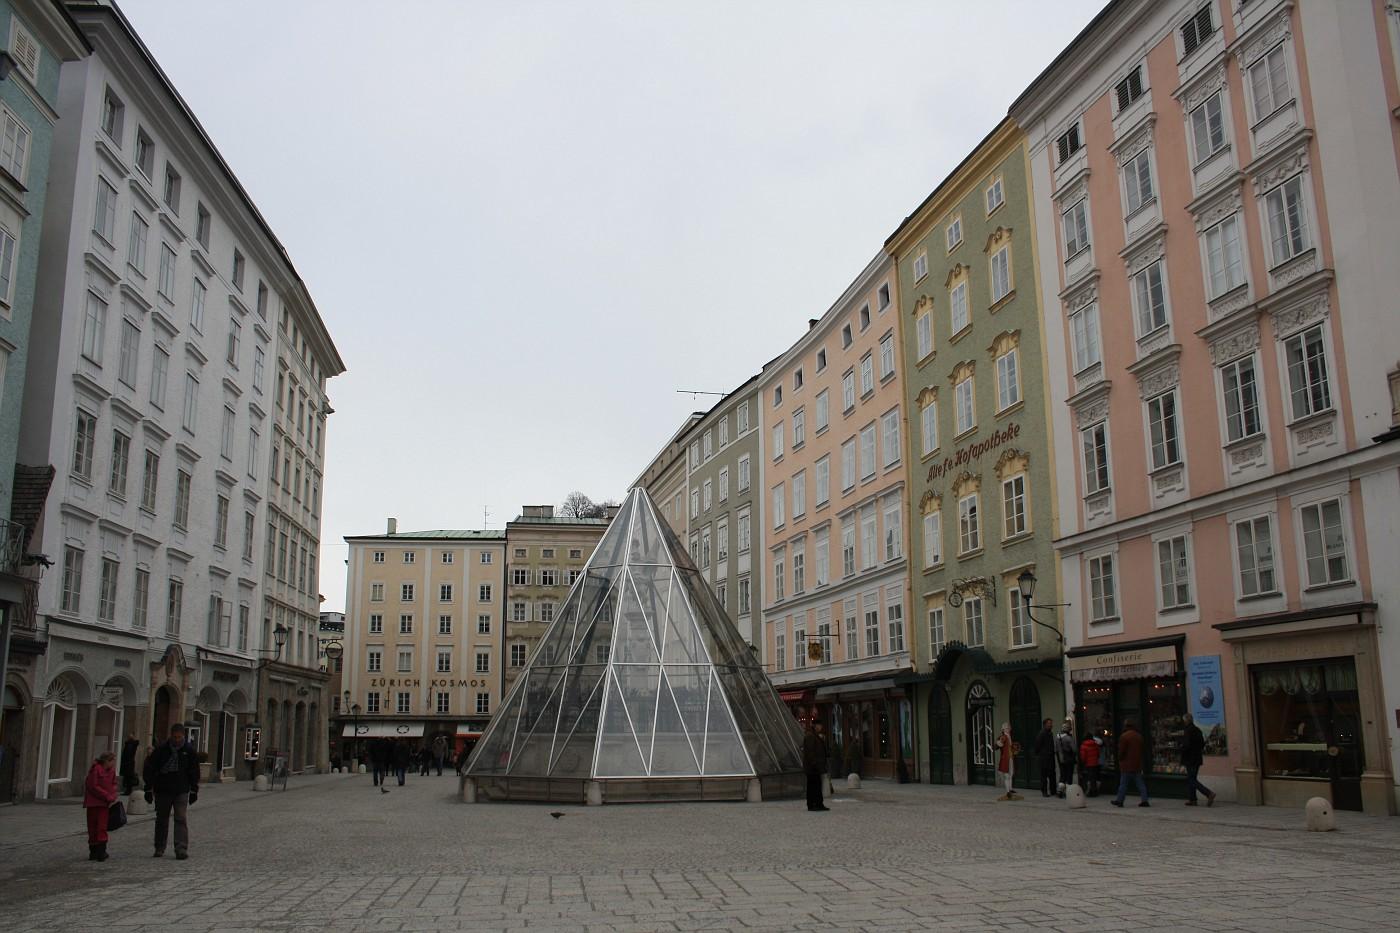 http://images112.fotki.com/v173/photos/2/243162/8488810/Salzburg28-vi.jpg